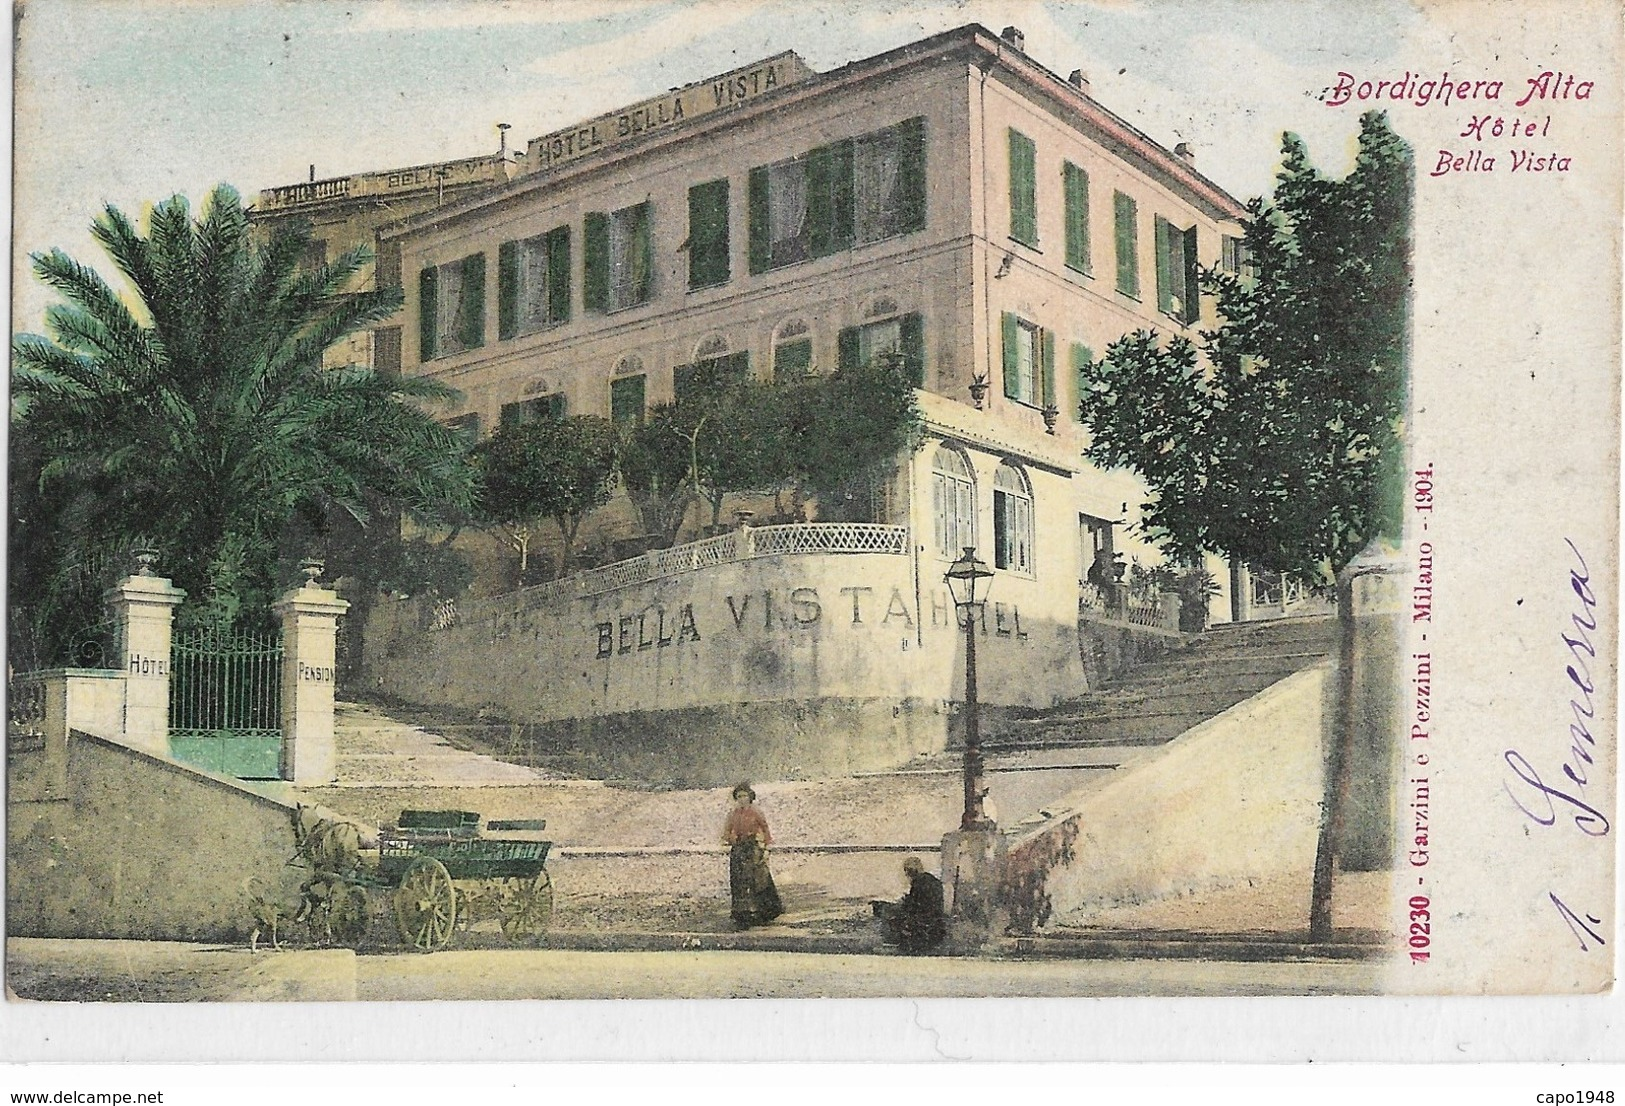 CARD  BORDIGHERA ALTA  HOTEL BELLA VISTA        (IMPERIA)-FP-V -2-   0882-28513 - Imperia